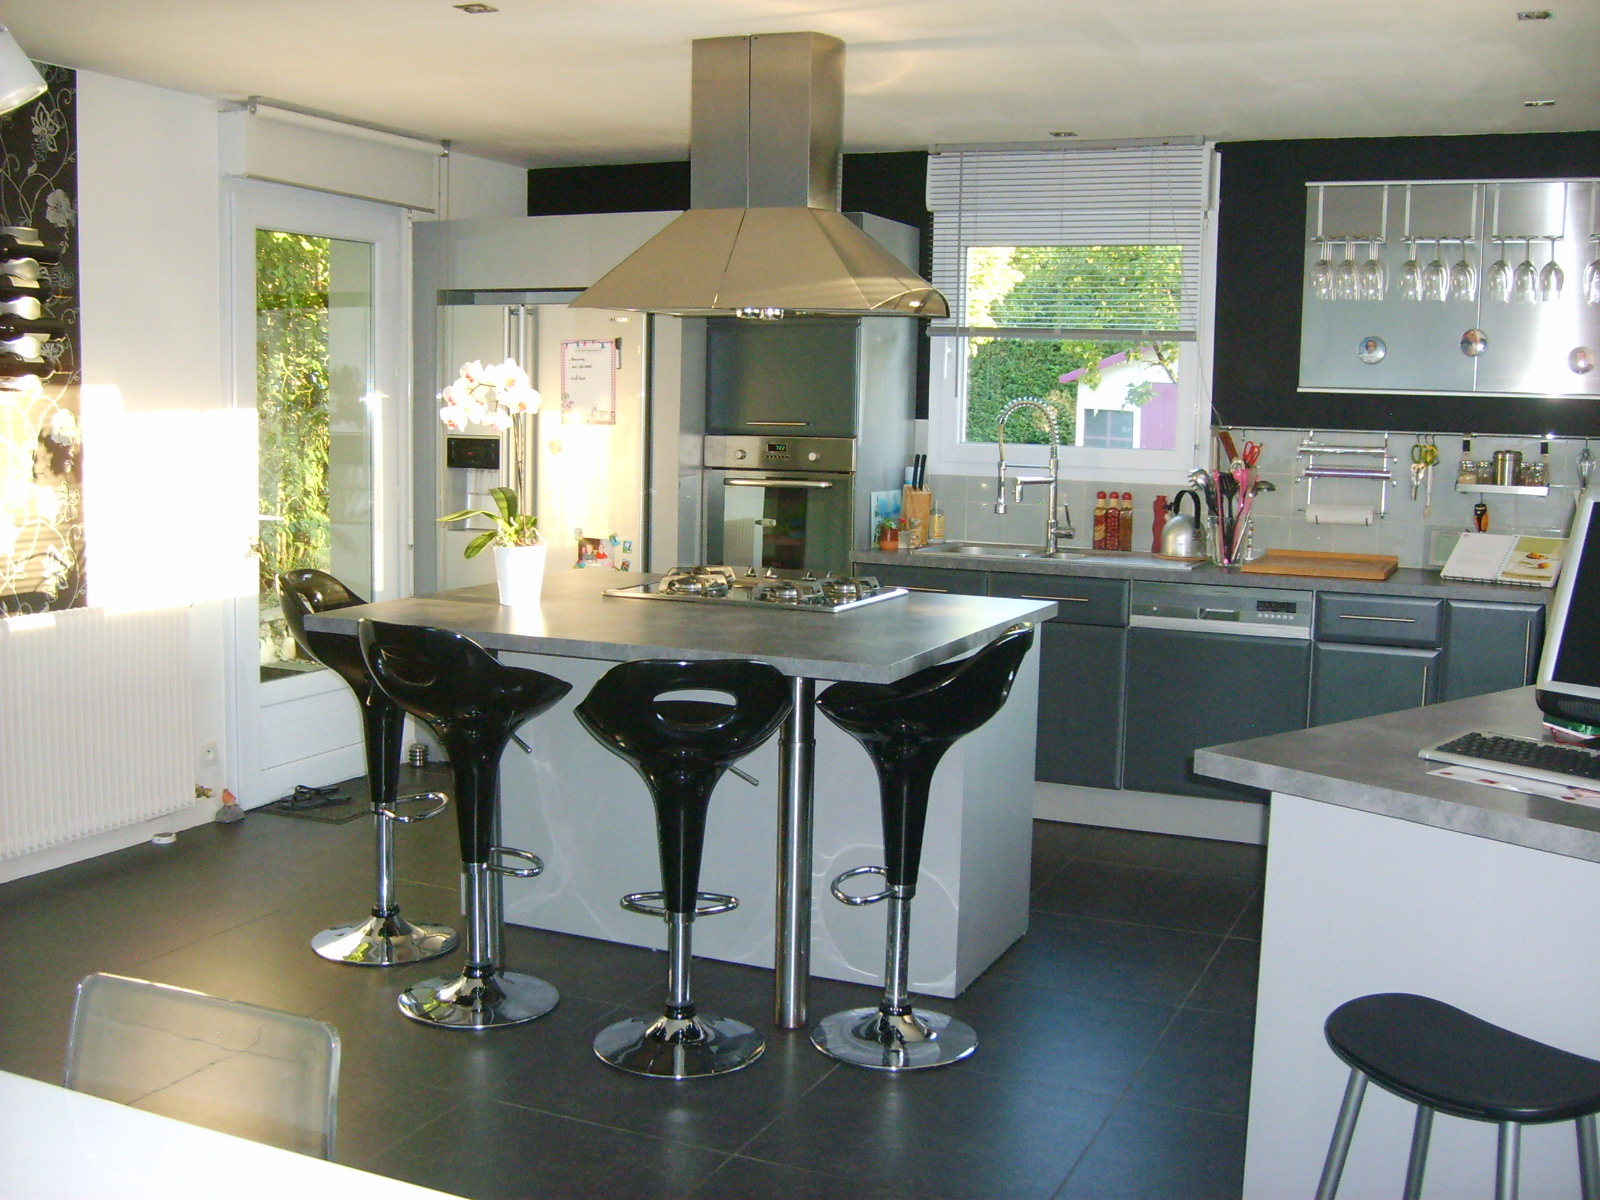 L'Atelier du 15 relooking cuisine